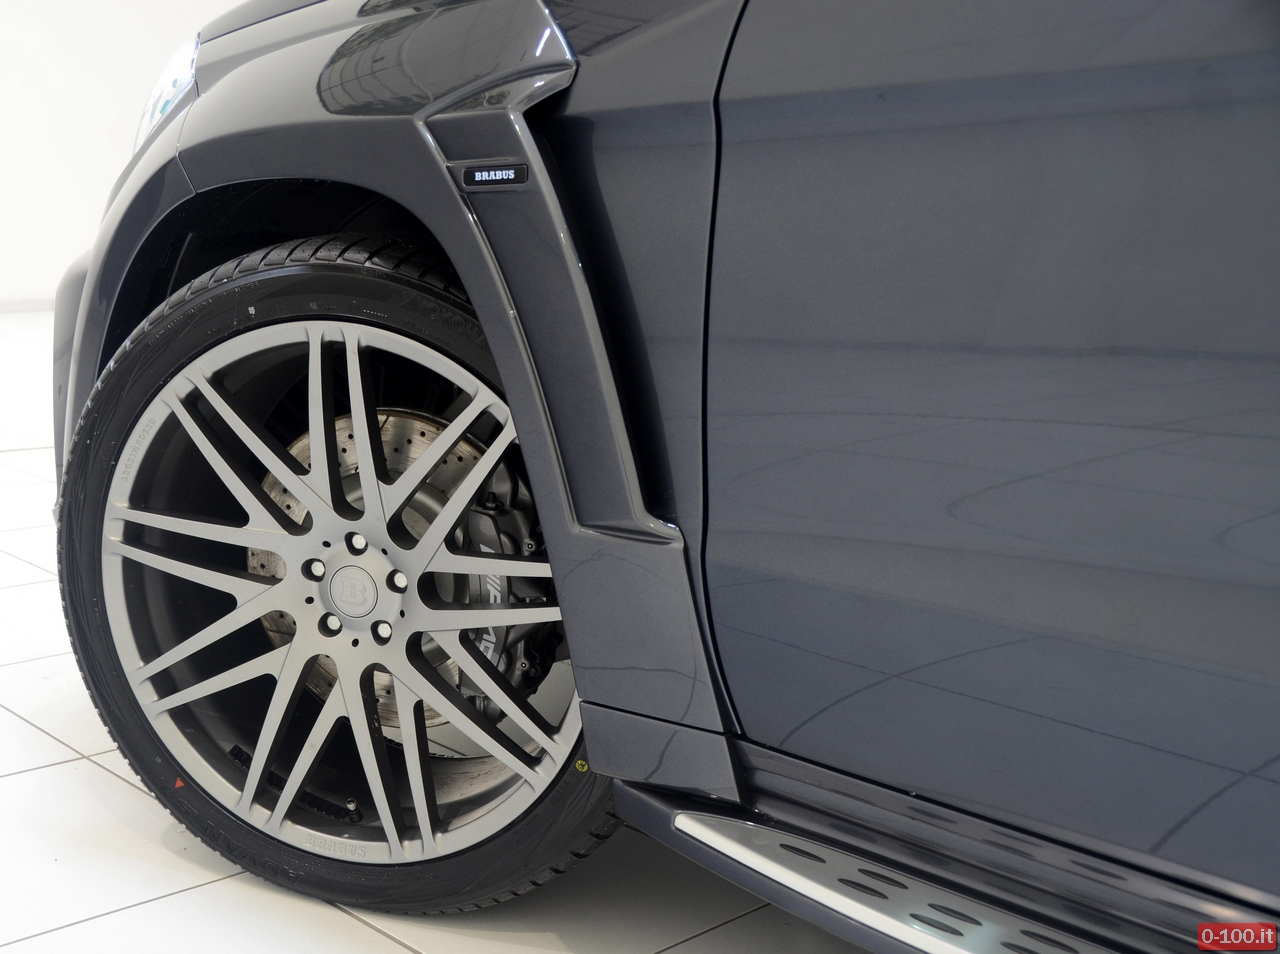 brabus_B63S_700_widestar_Mercedes_GL63-AMG_0-100_9